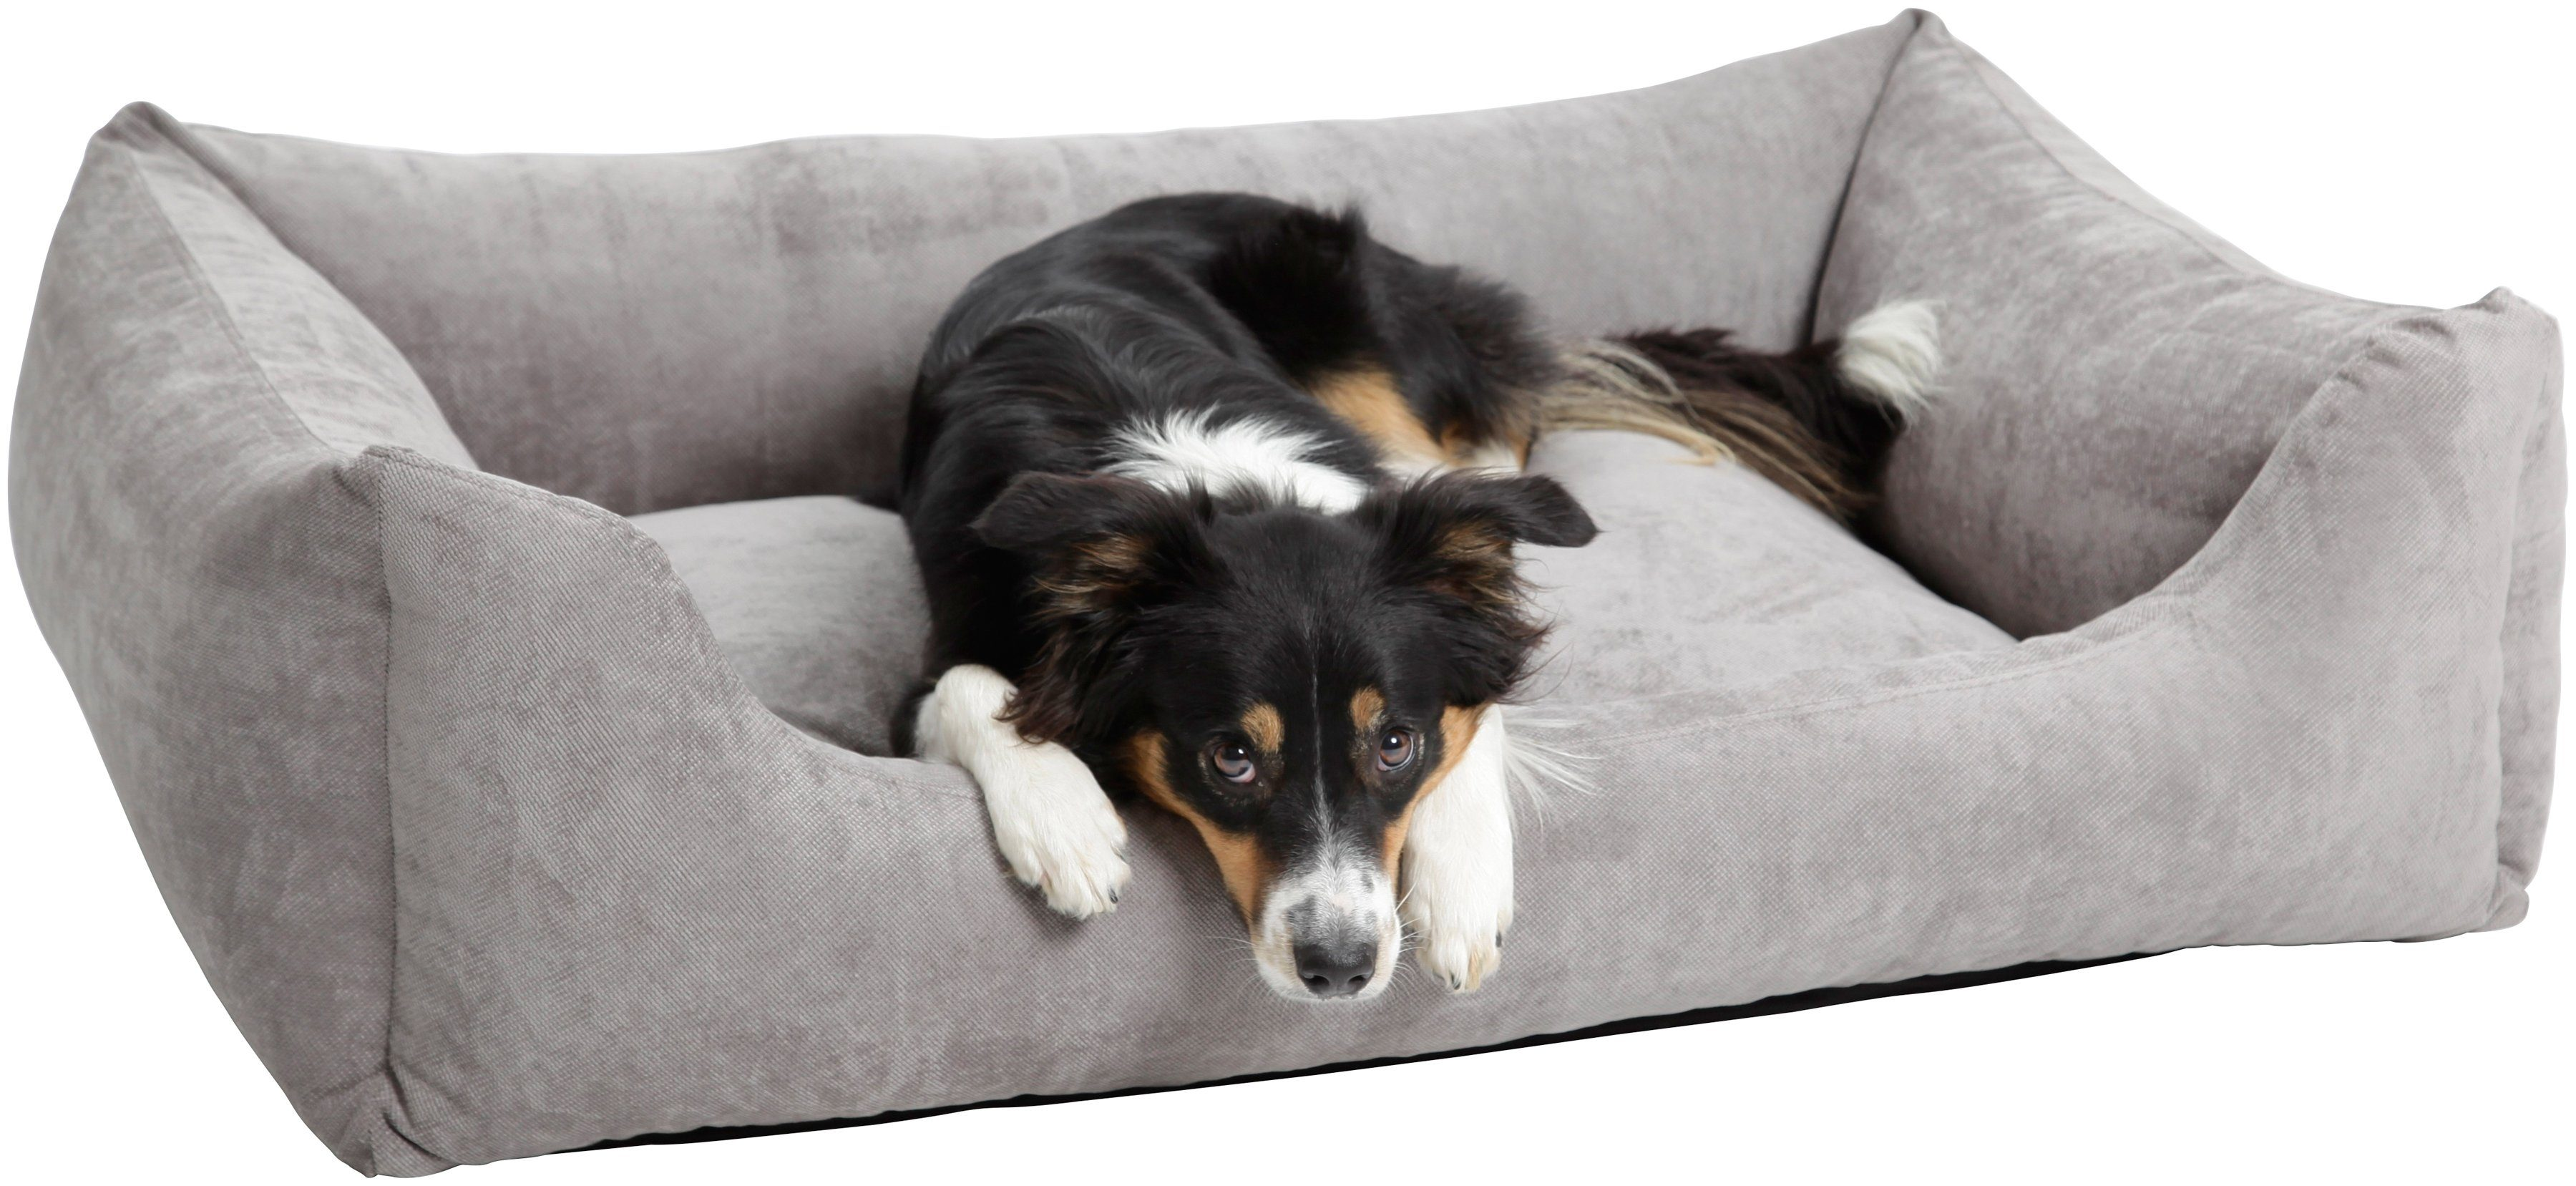 Hundebett und Katzenbett »Madison«, B/T/H: 100/80/30 cm, Grau